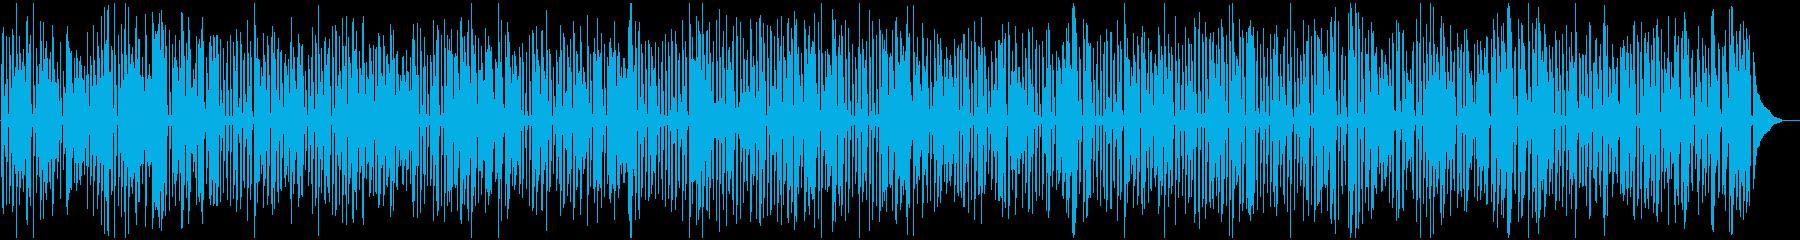 YouTube、軽快、楽しいジャズピアノの再生済みの波形